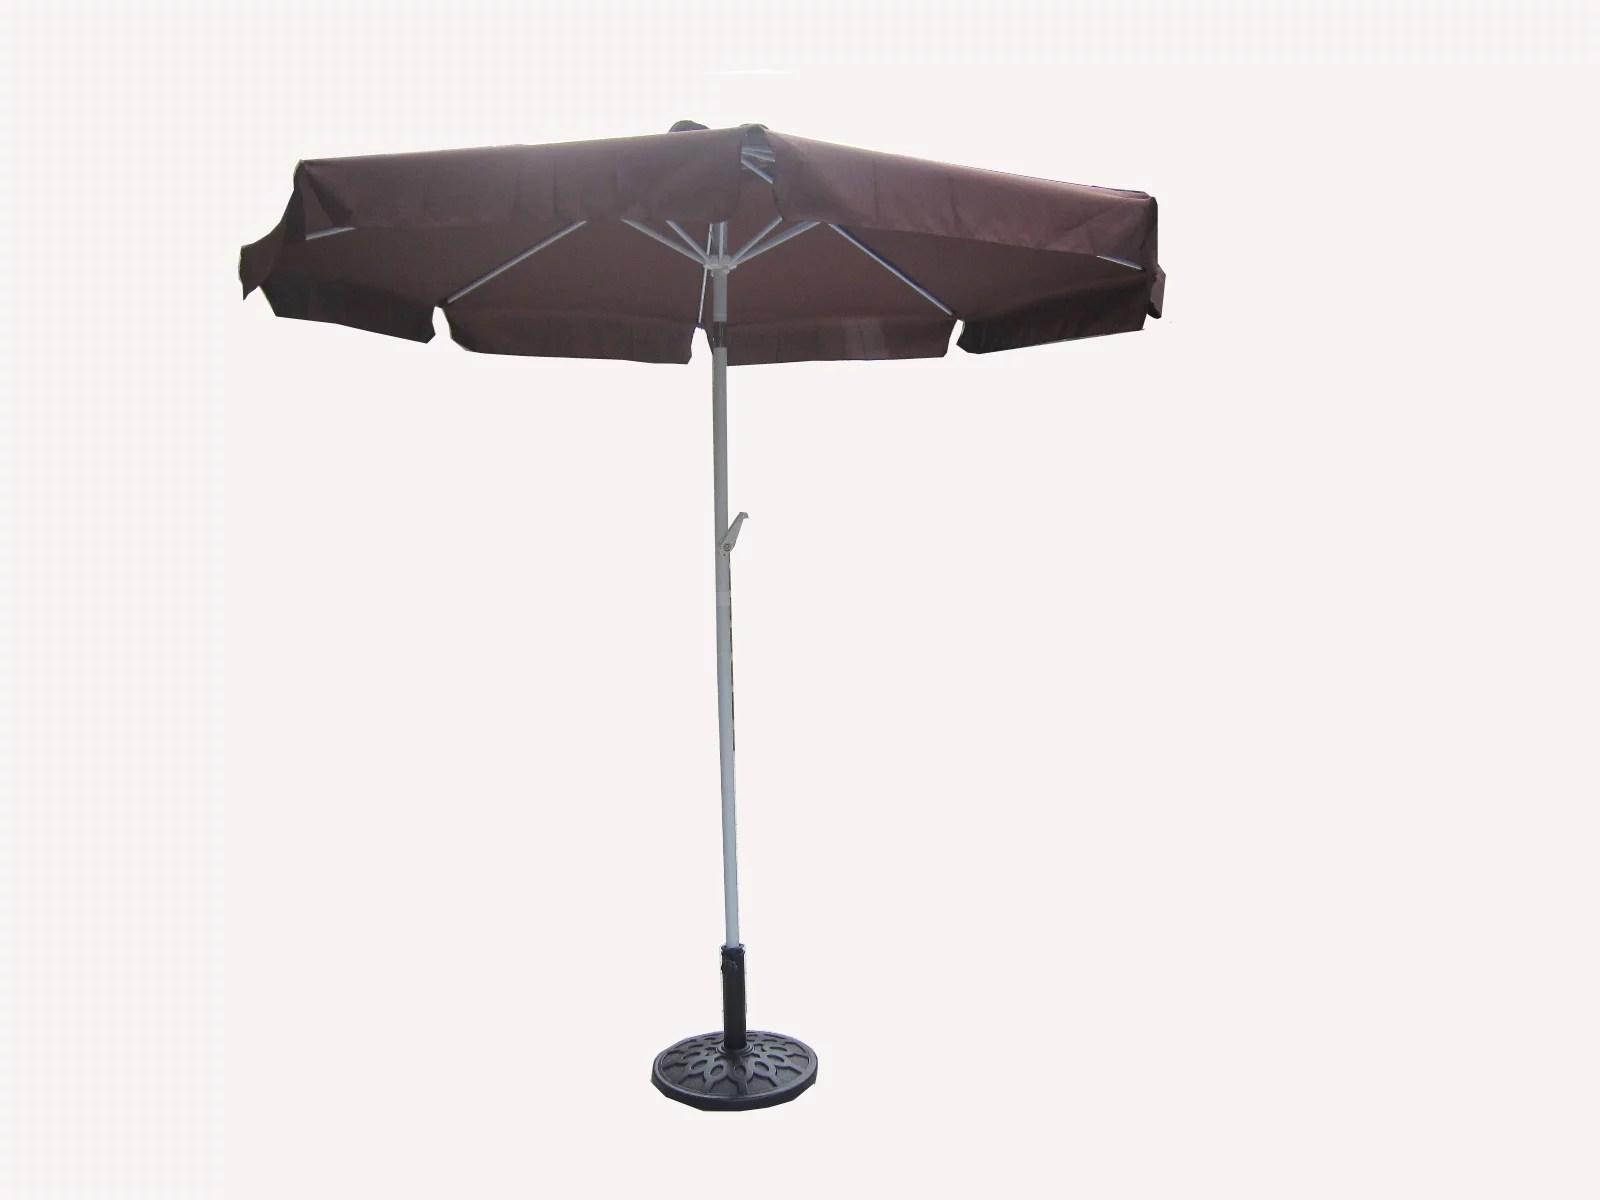 Outdoor Patio Market Umbrella 75 Ft With Hand Crank